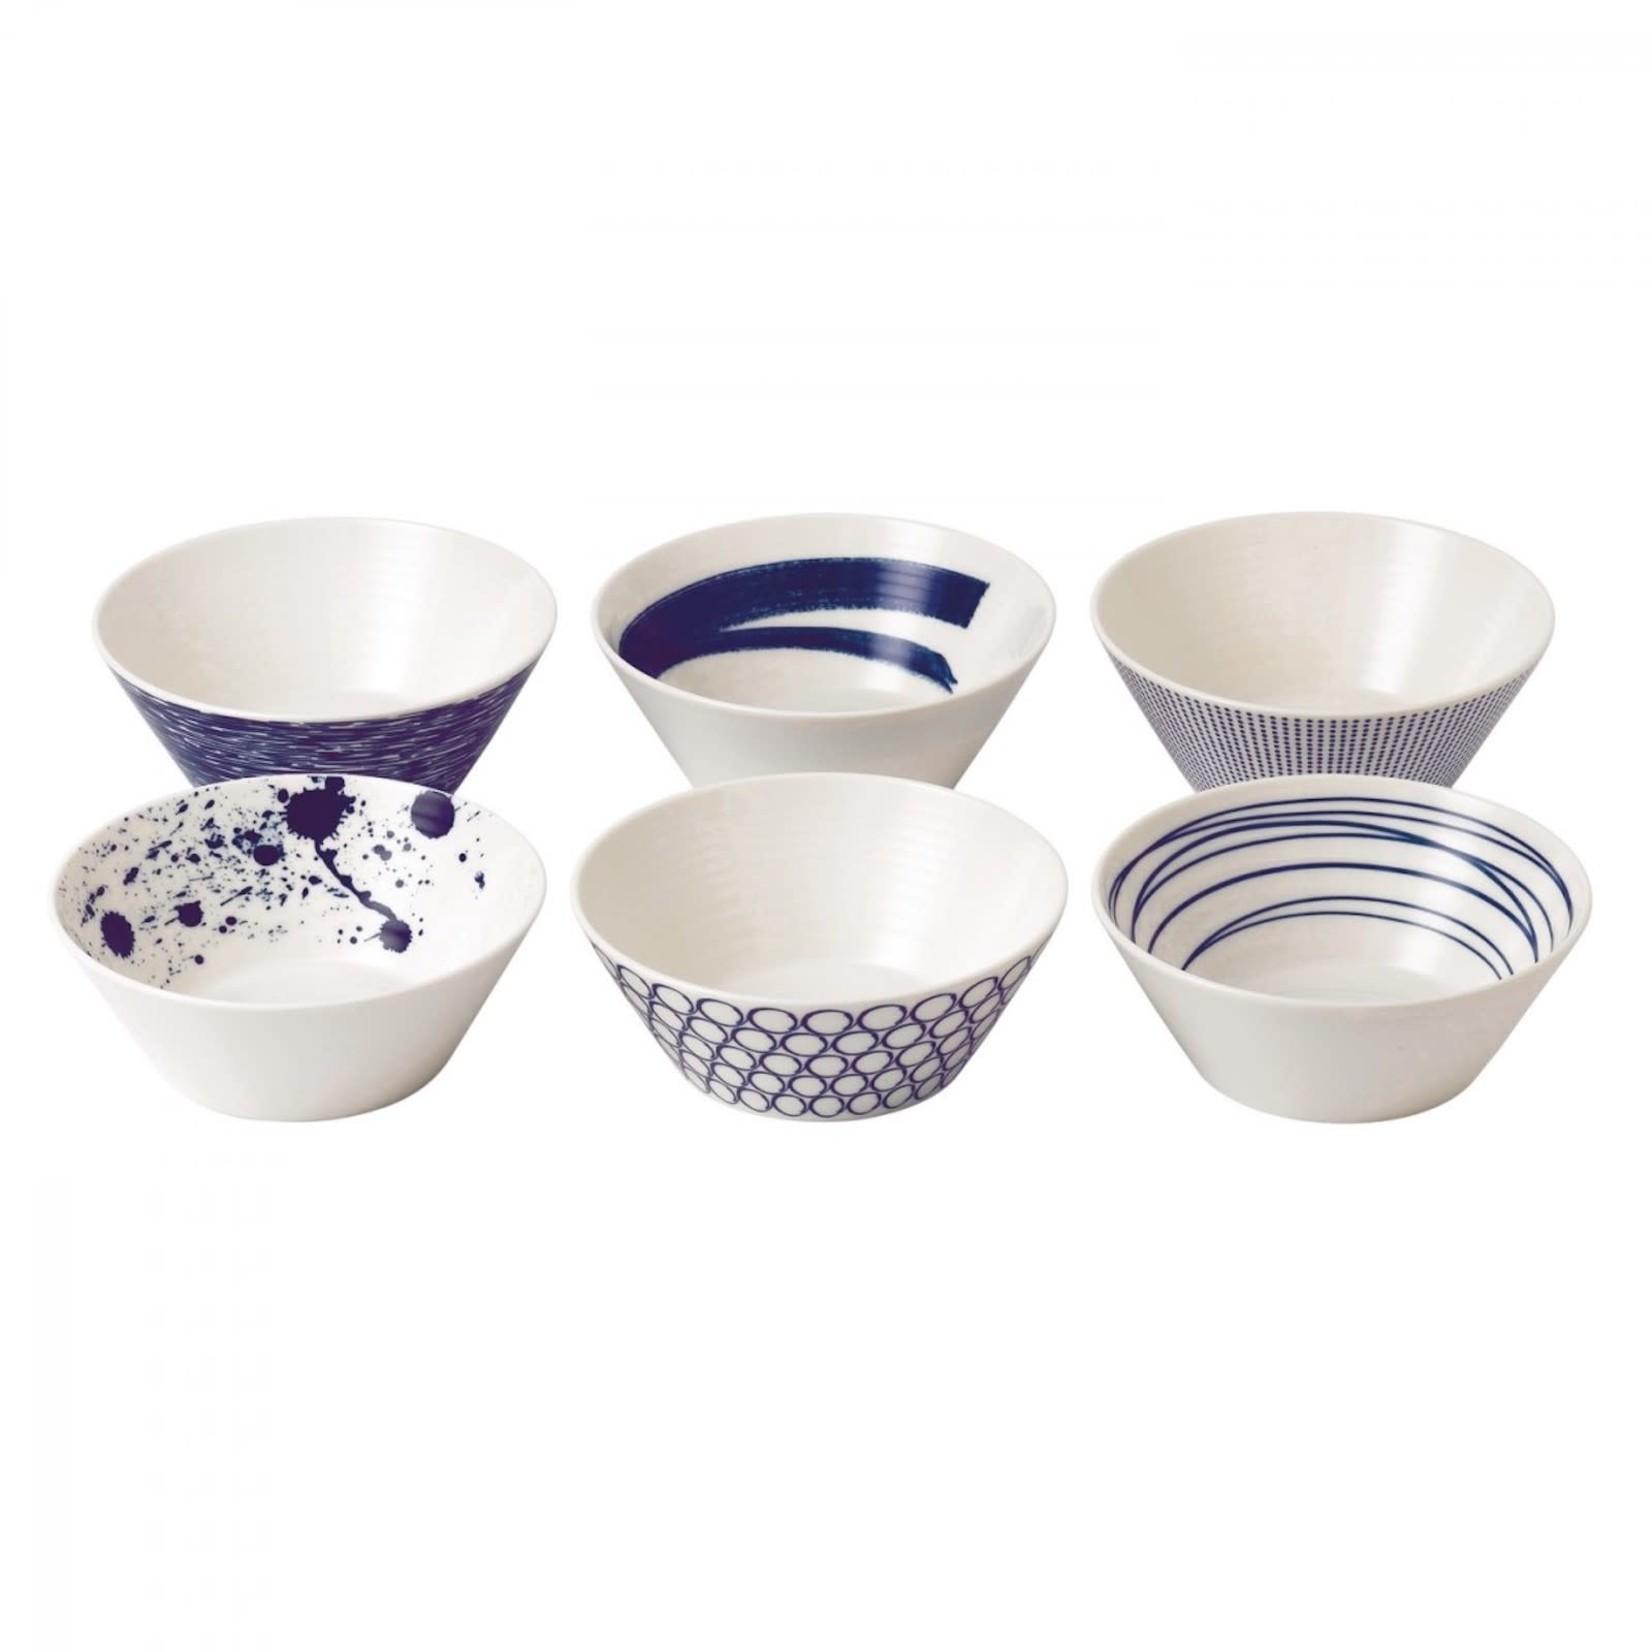 Royal Doulton Pacific Cereal Bowls Set of 6